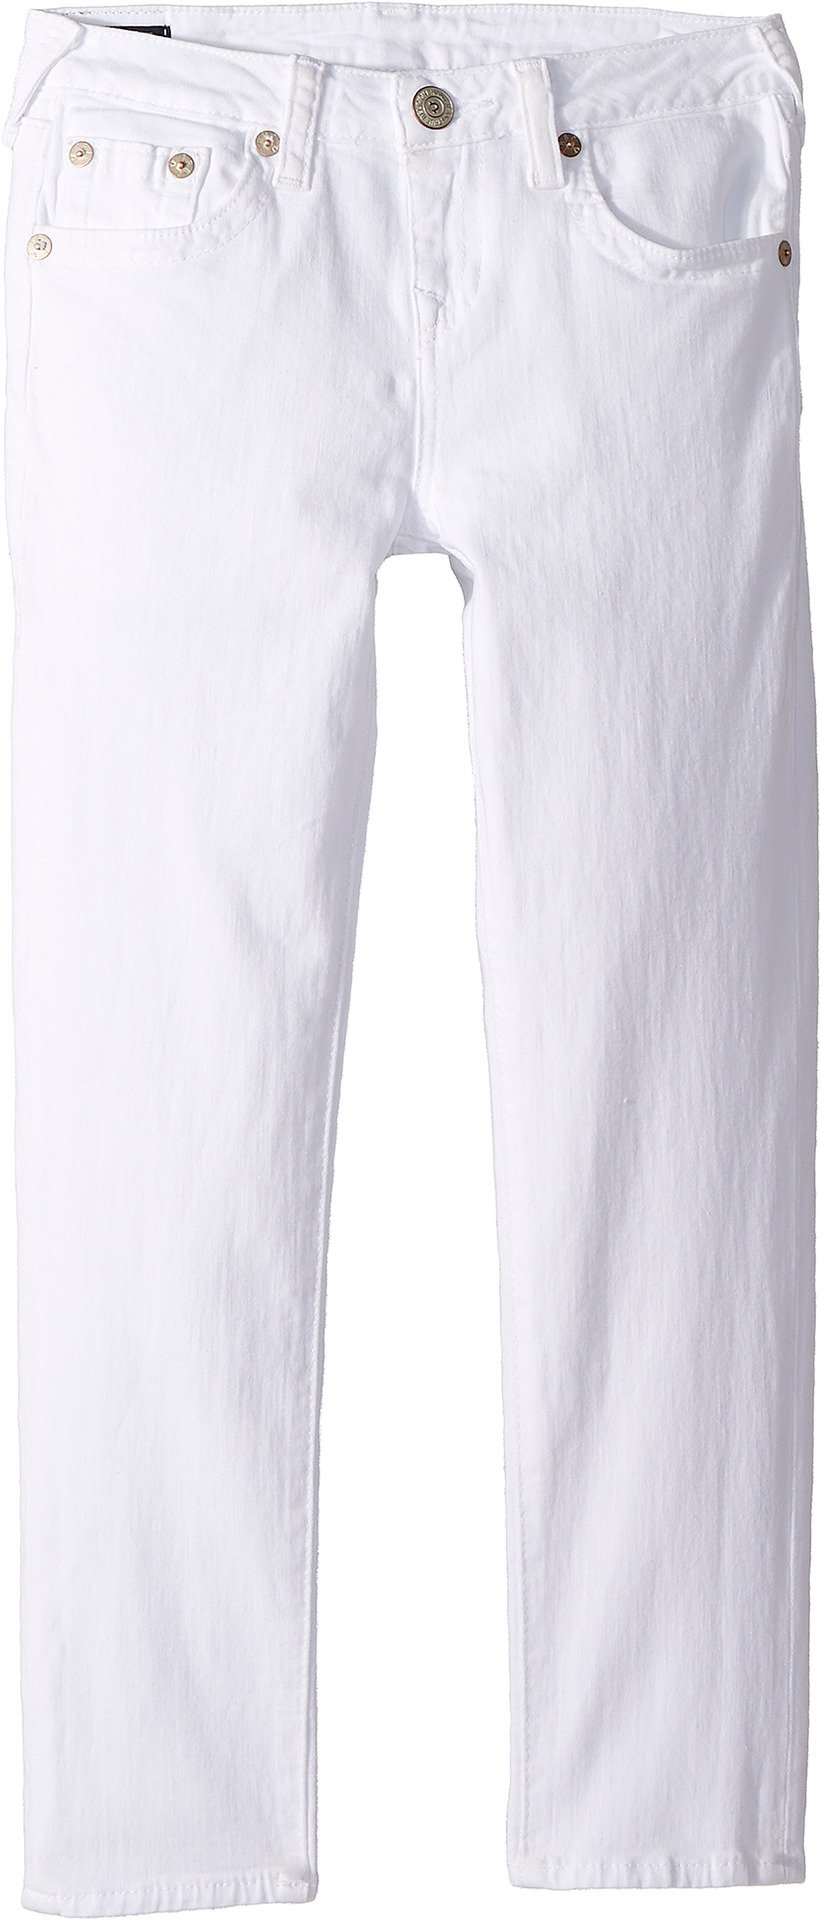 True Religion Kids Girl's Casey Ankle Skinny in Bleached White (Big Kids) Bleached White 16 by True Religion